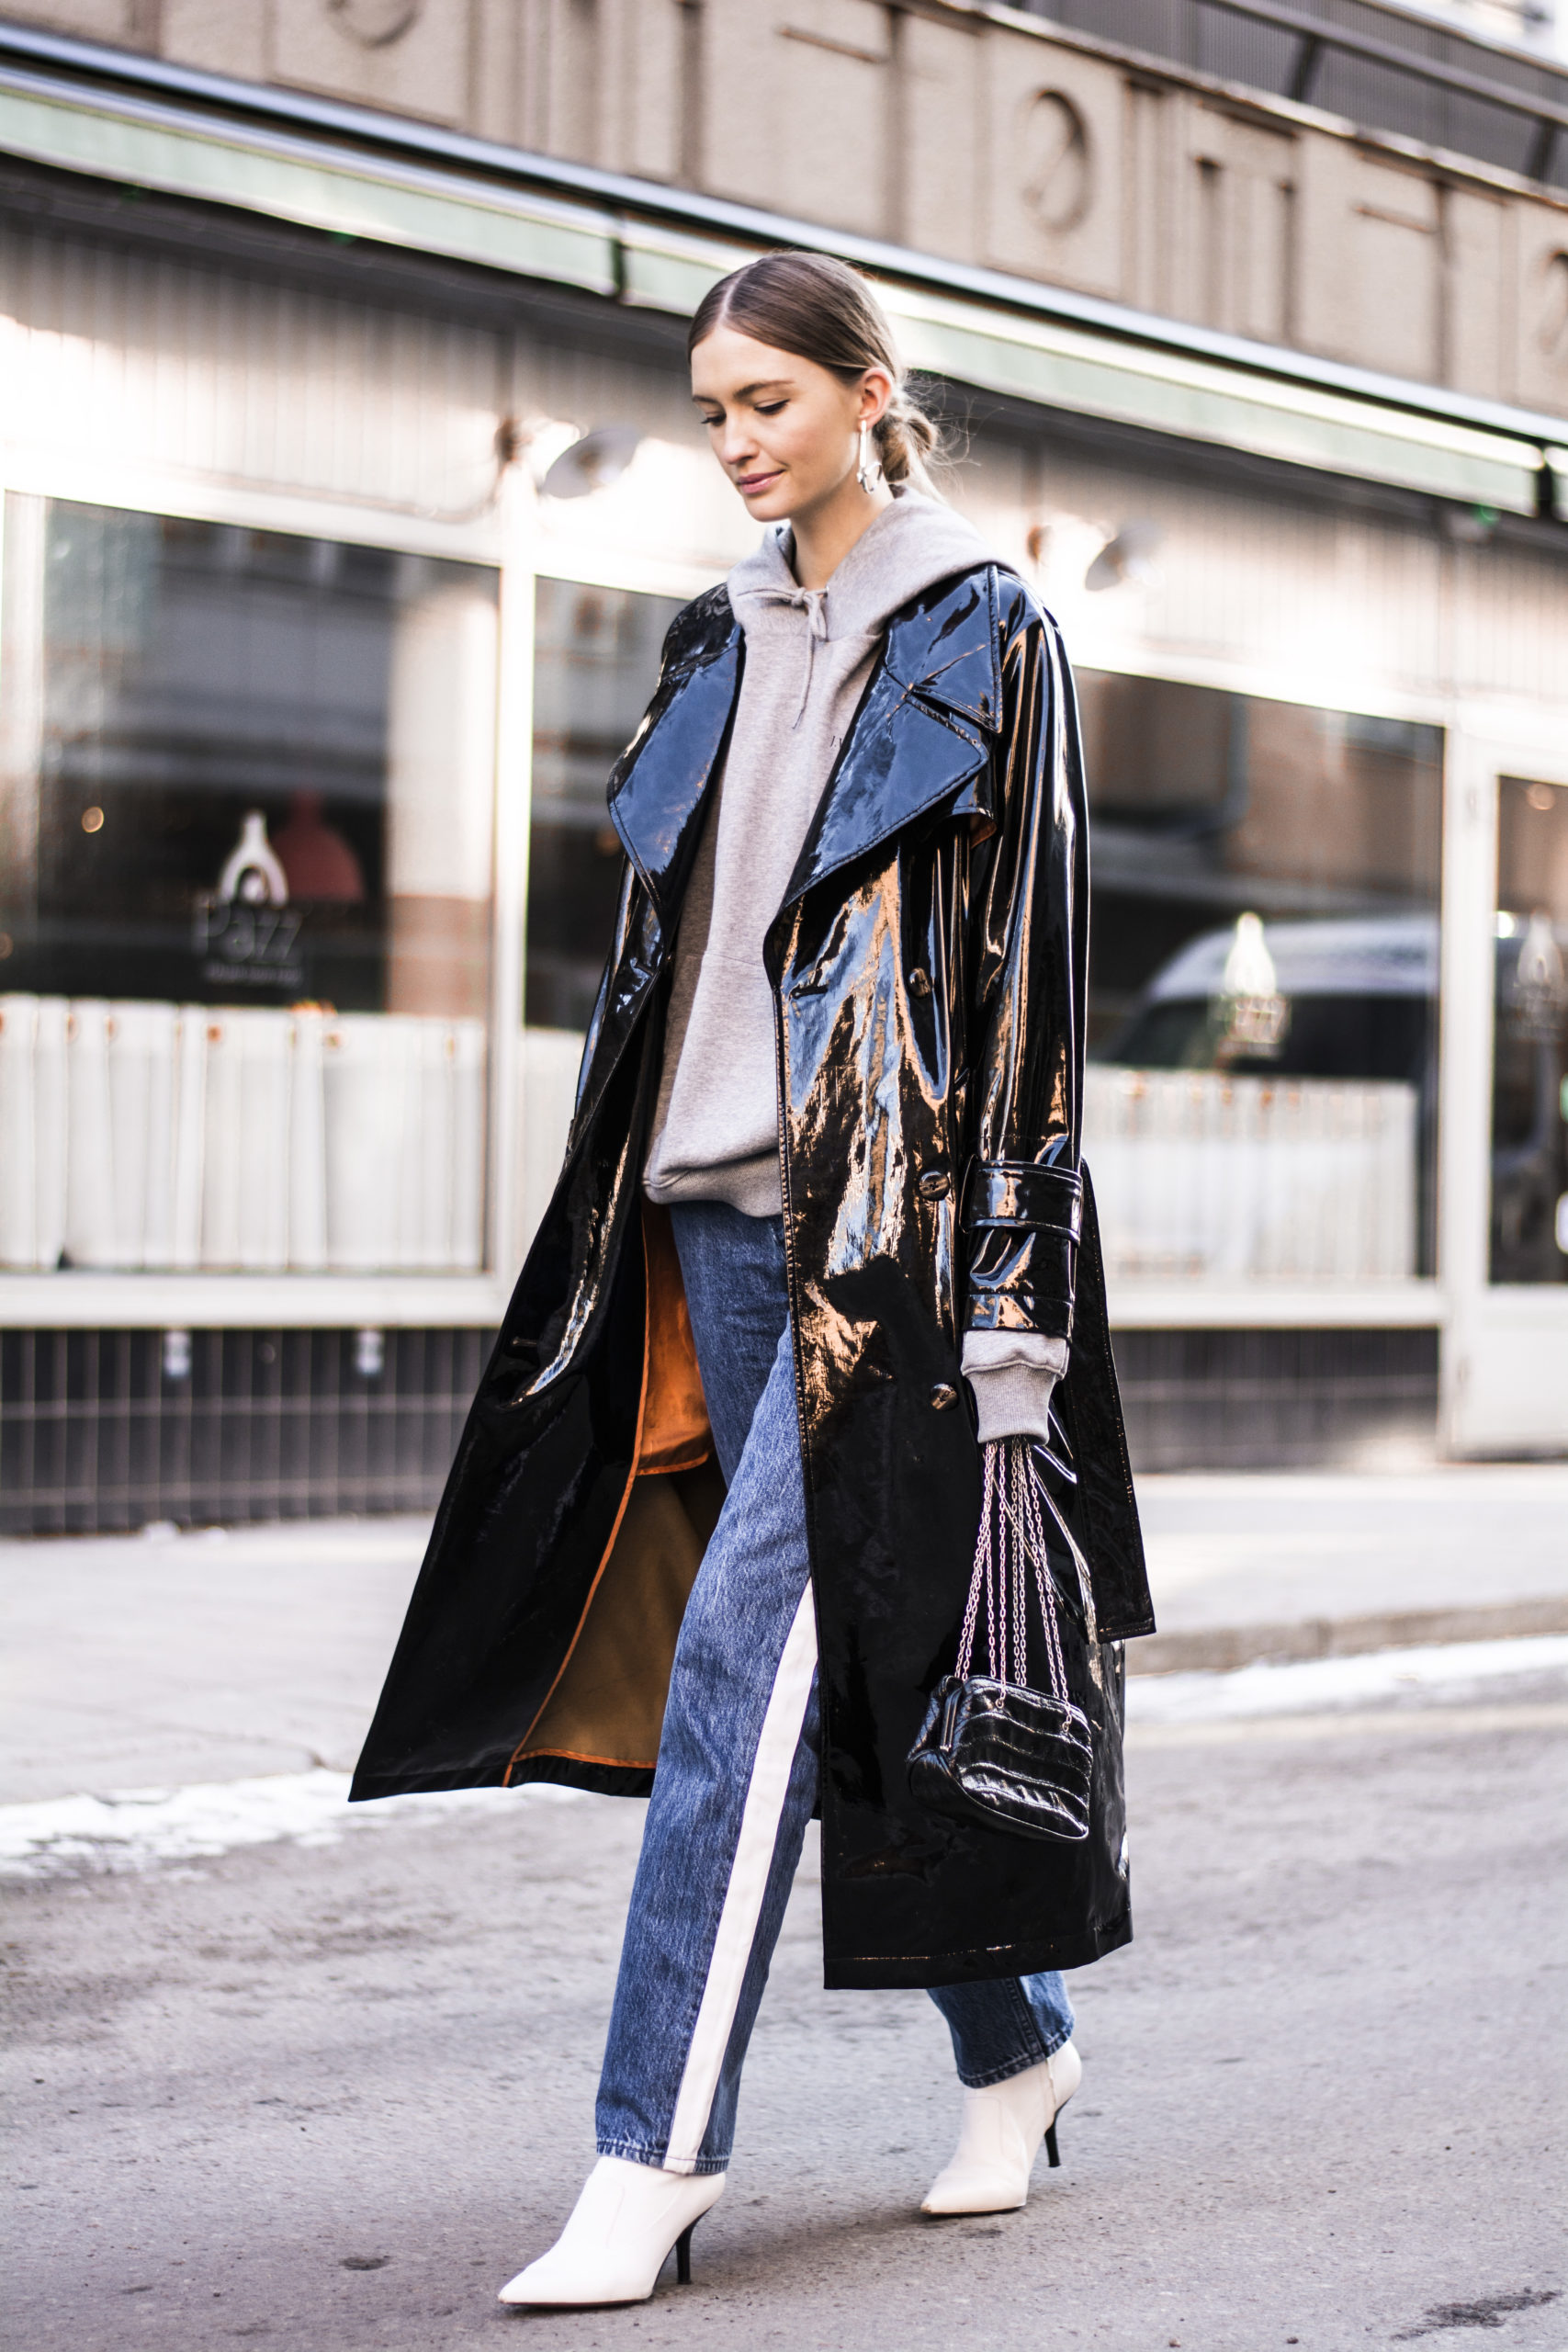 Modefoto av Josefine Persson